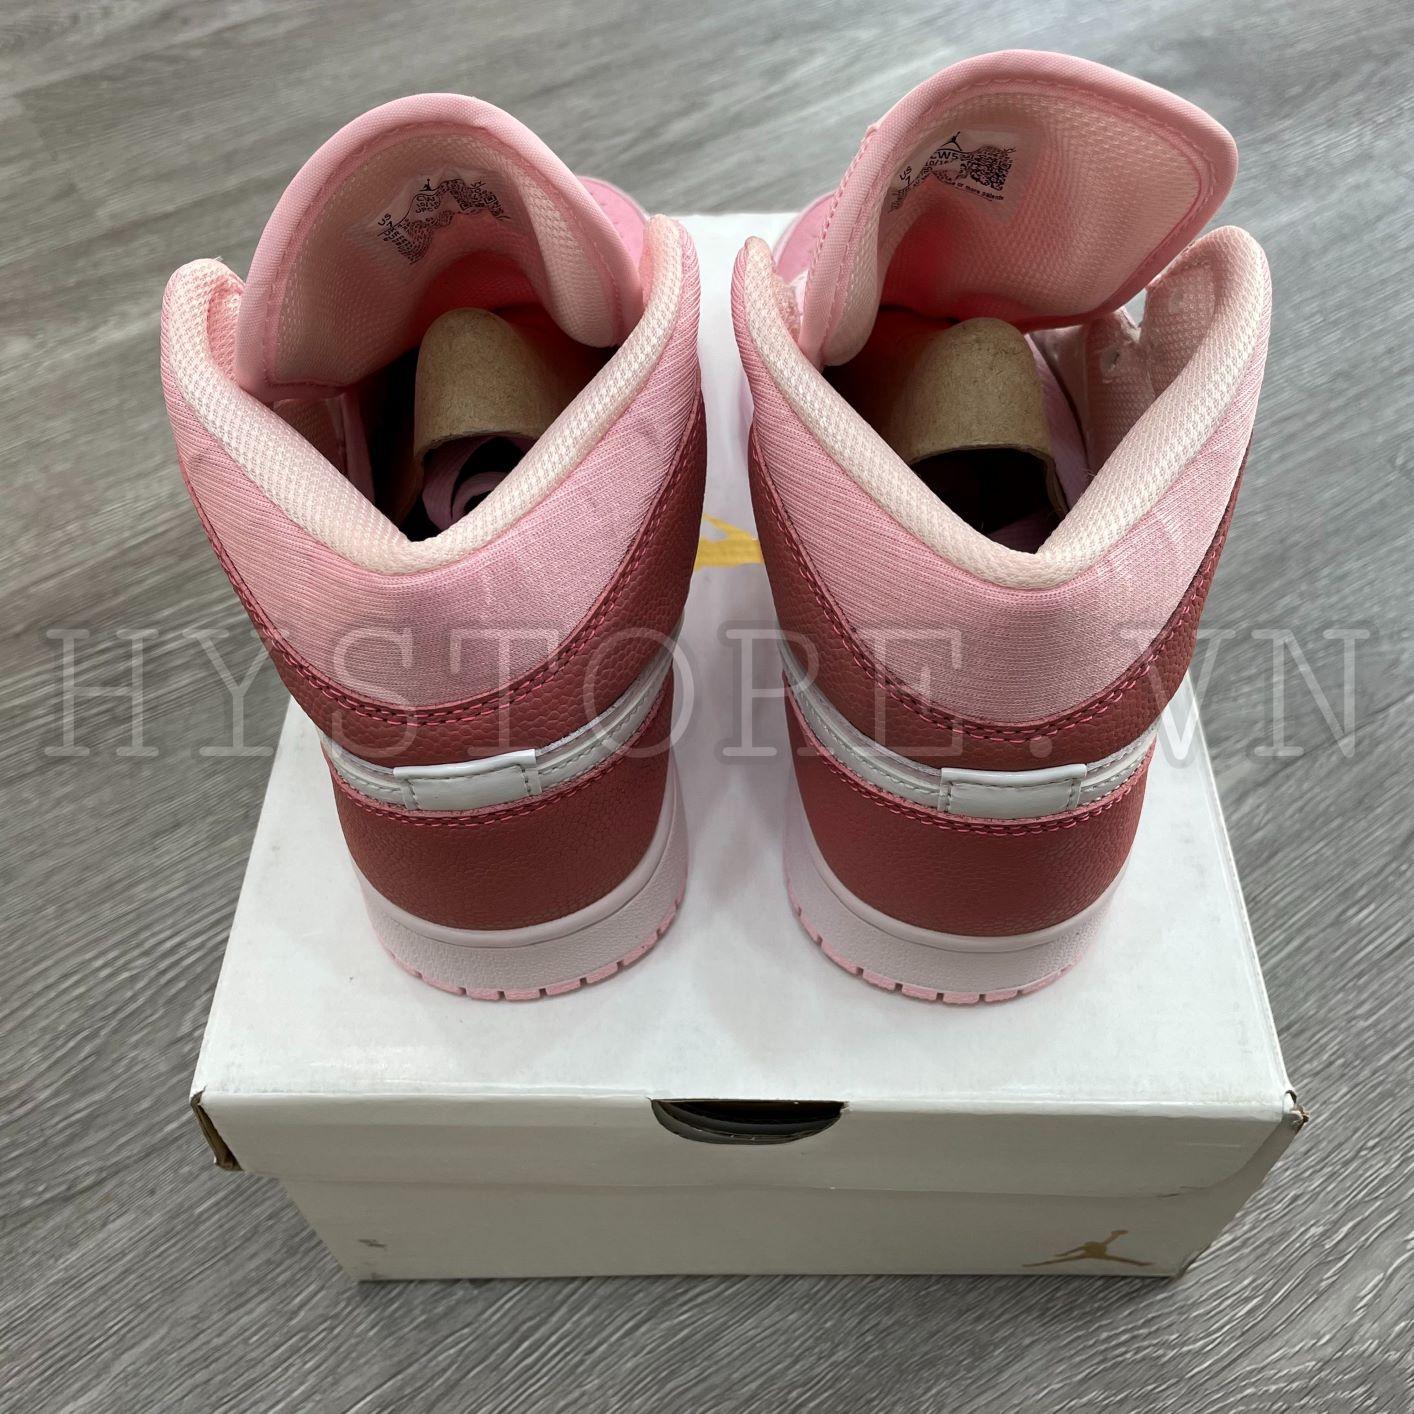 AJ1 Digital Pink